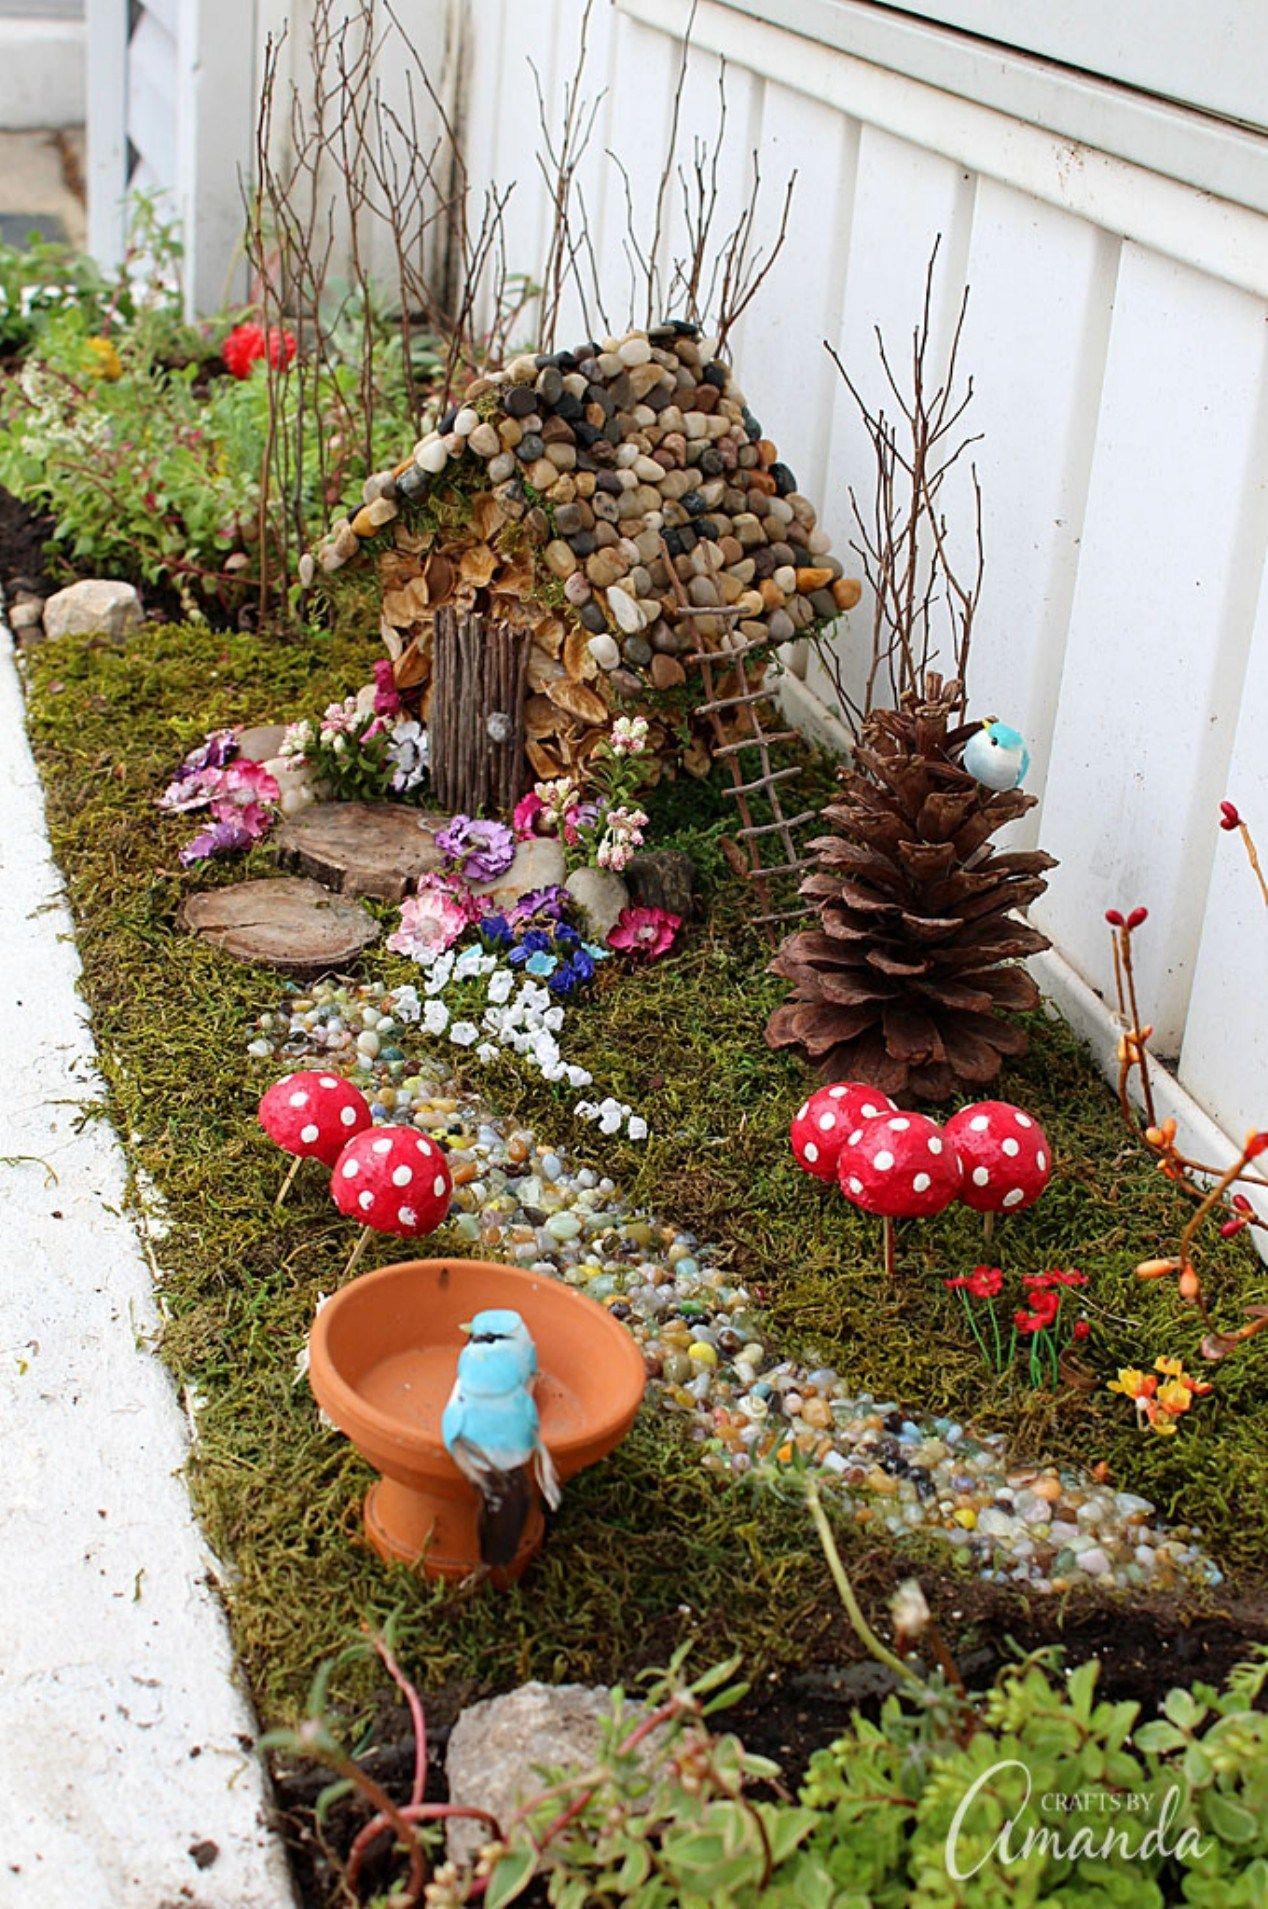 Absorbing Diy Inspiration Fairy Garden Ideas Diy Inspiration Fairy Garden Ideas Garden Accessories Diy Fairy Garden Kids Party Diy Fairy Garden Kids garden Diy Fairy Garden For Kids